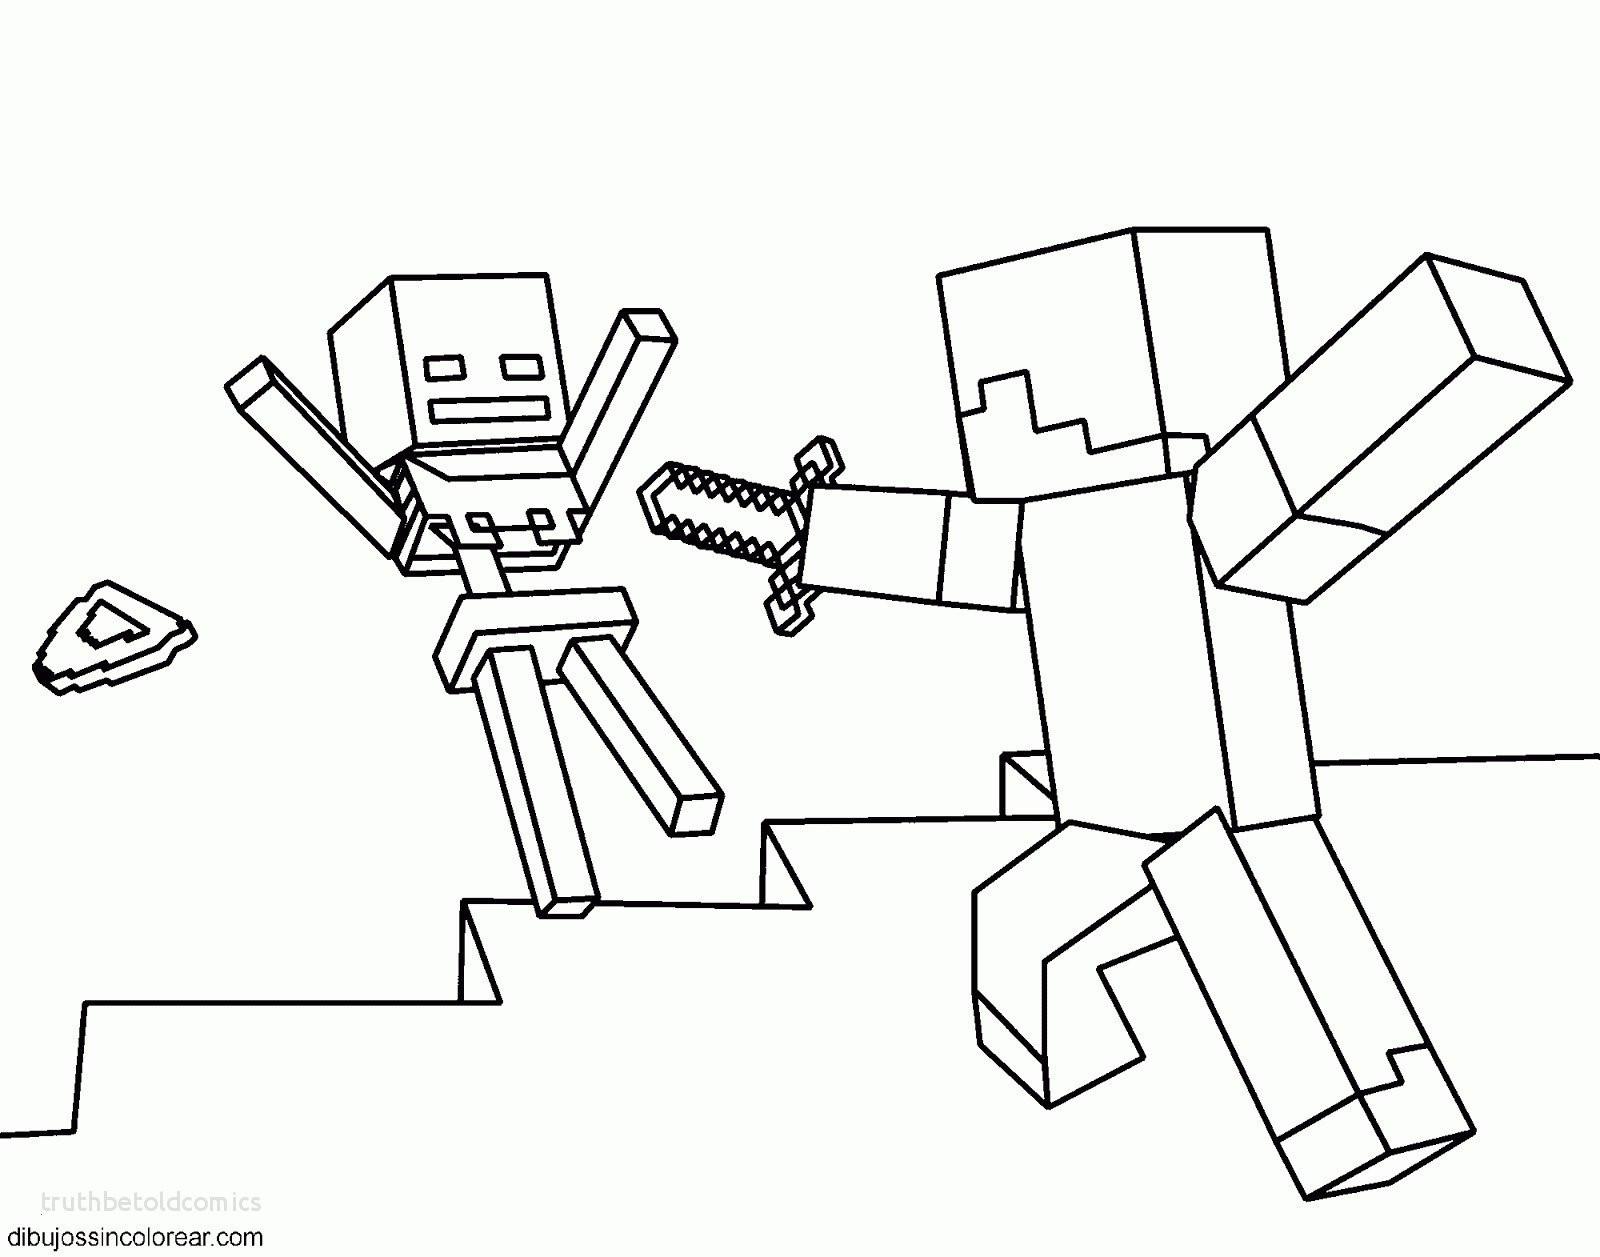 Ausmalbilder Zoo Neu Coloriage Minecraft Creeper Rises Meilleures 45 Frisch Fotos